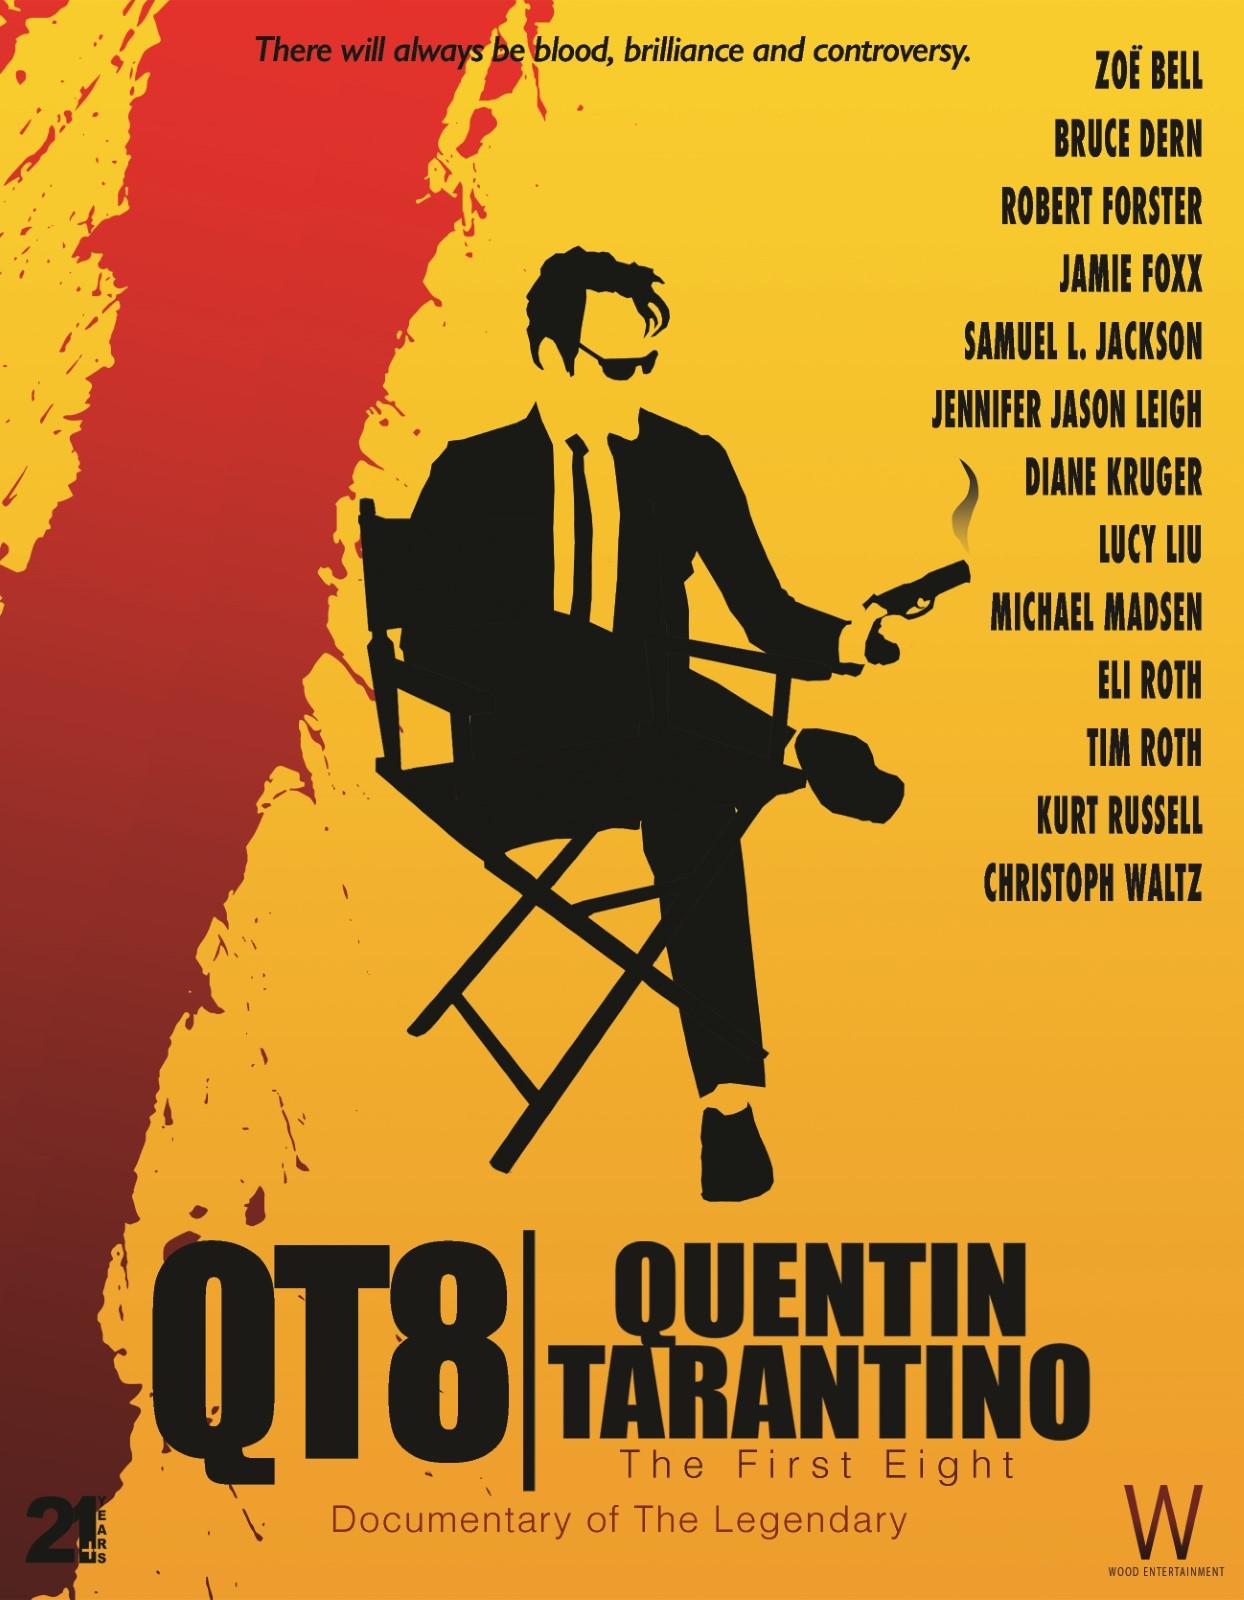 affiche du film QT8 : Tarantino en huit films